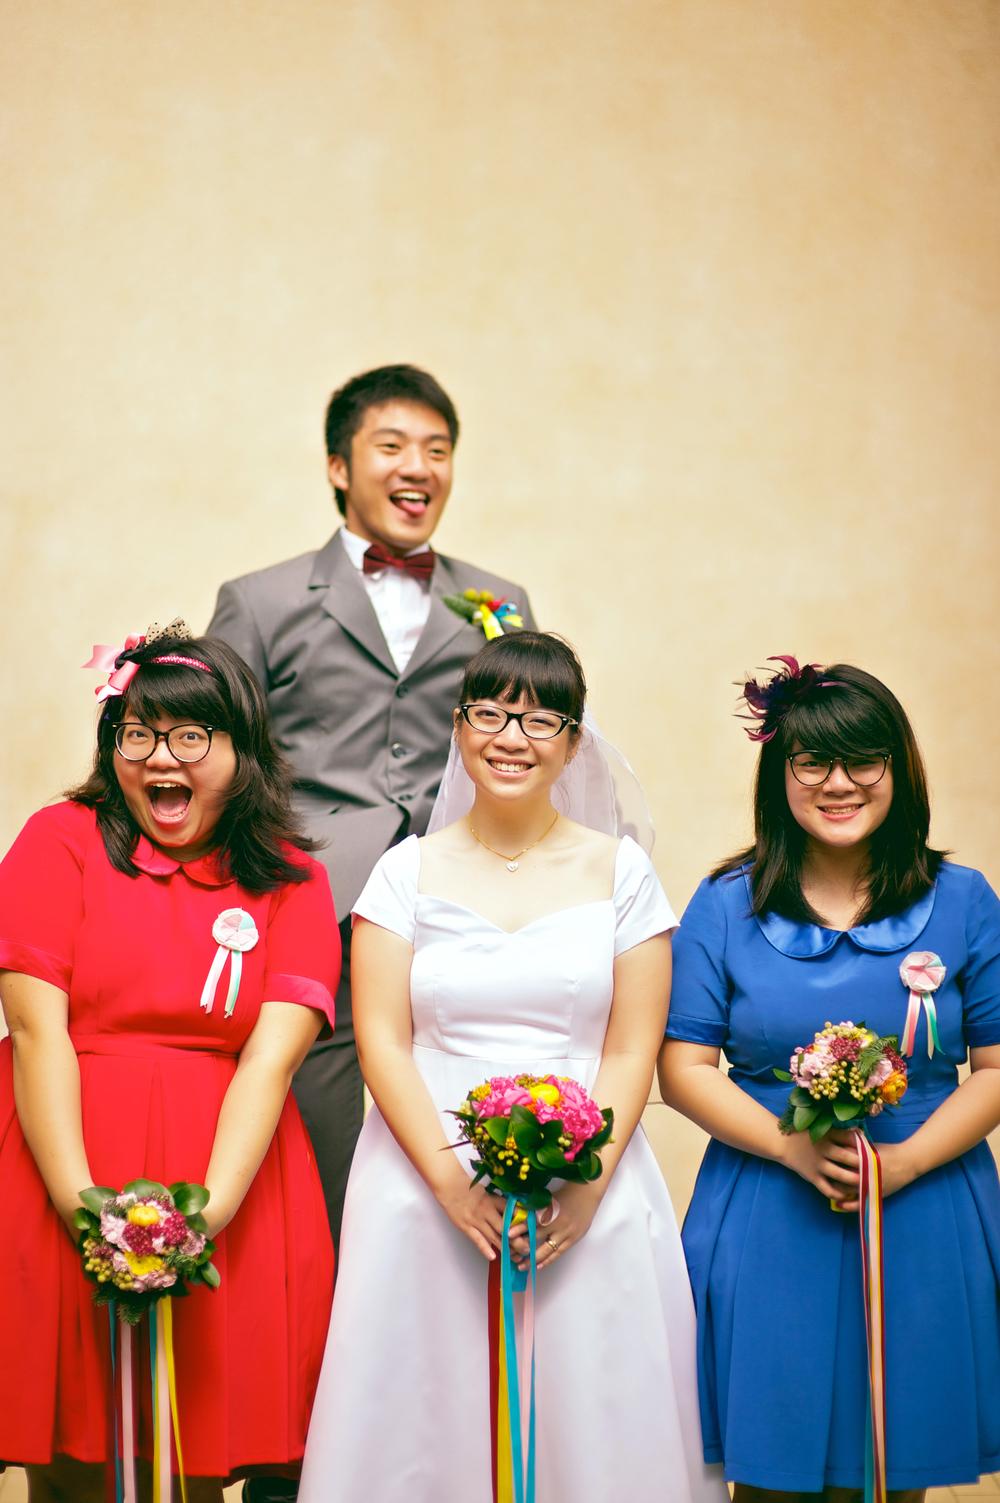 Weiyan's sister's wedding in 2011